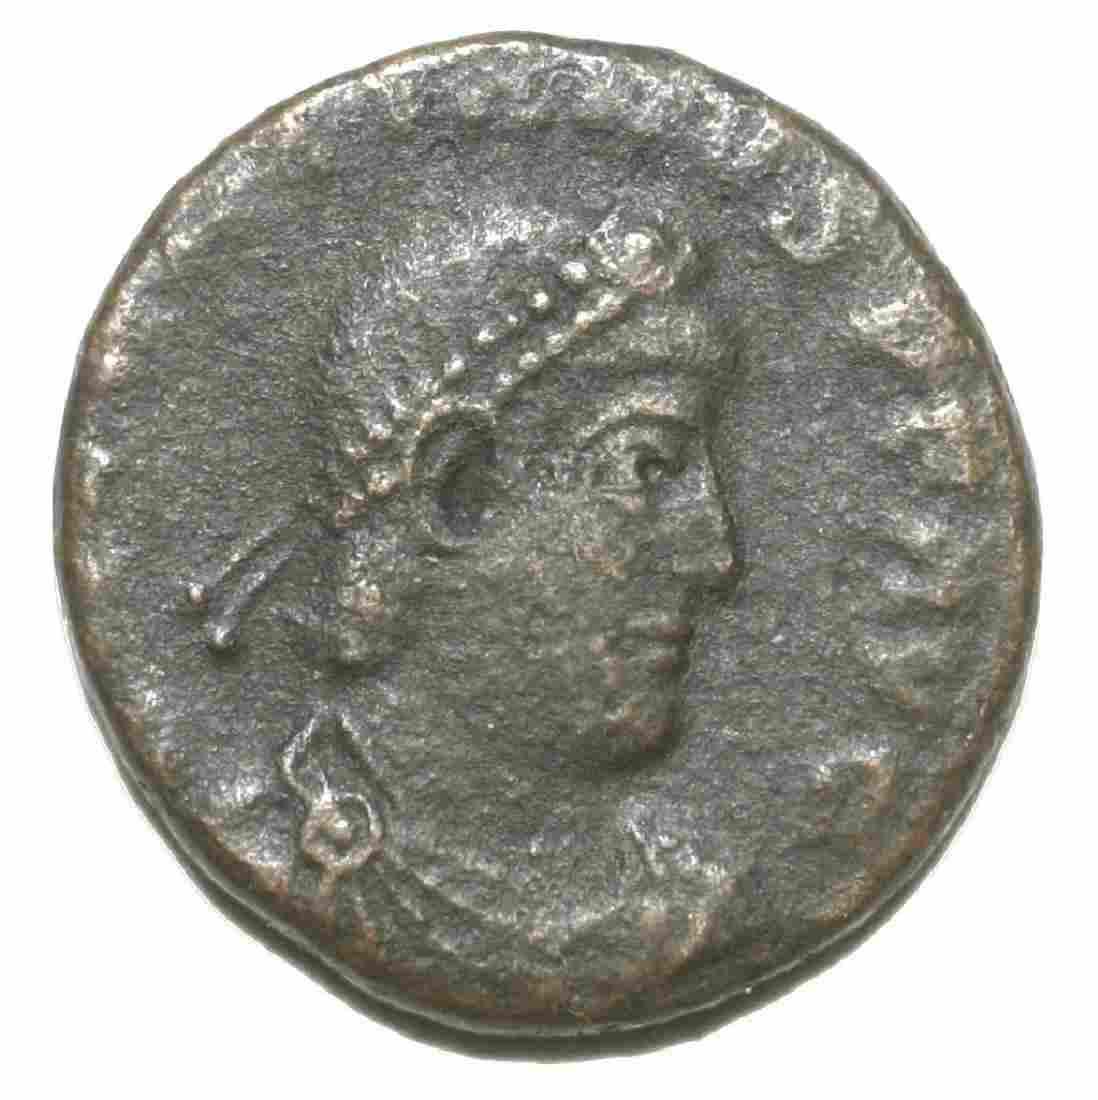 Roman Bronze Coin Follis Valentinianus Gloria Romanorum